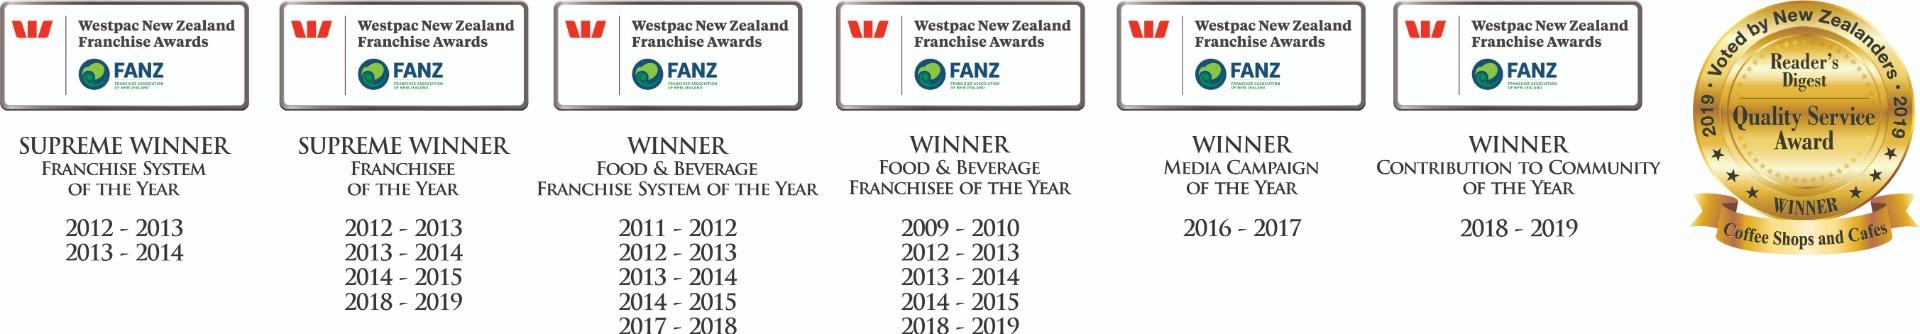 The Coffee Club awards logos